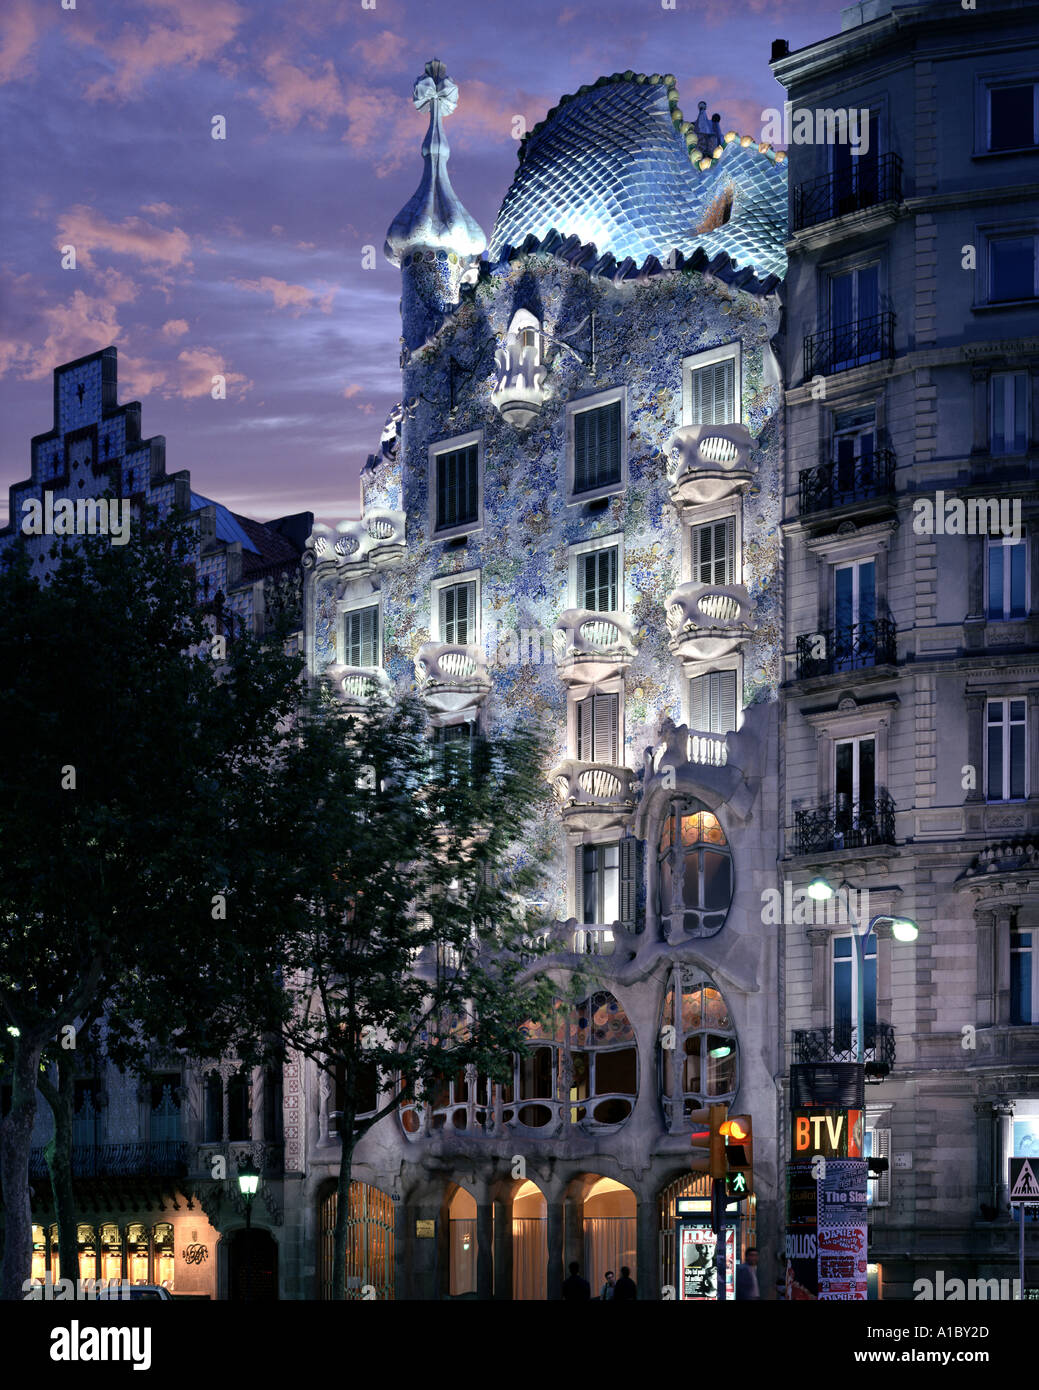 ES - BARCELONA: Casa Batlló von Antoni Gaudi Stockbild